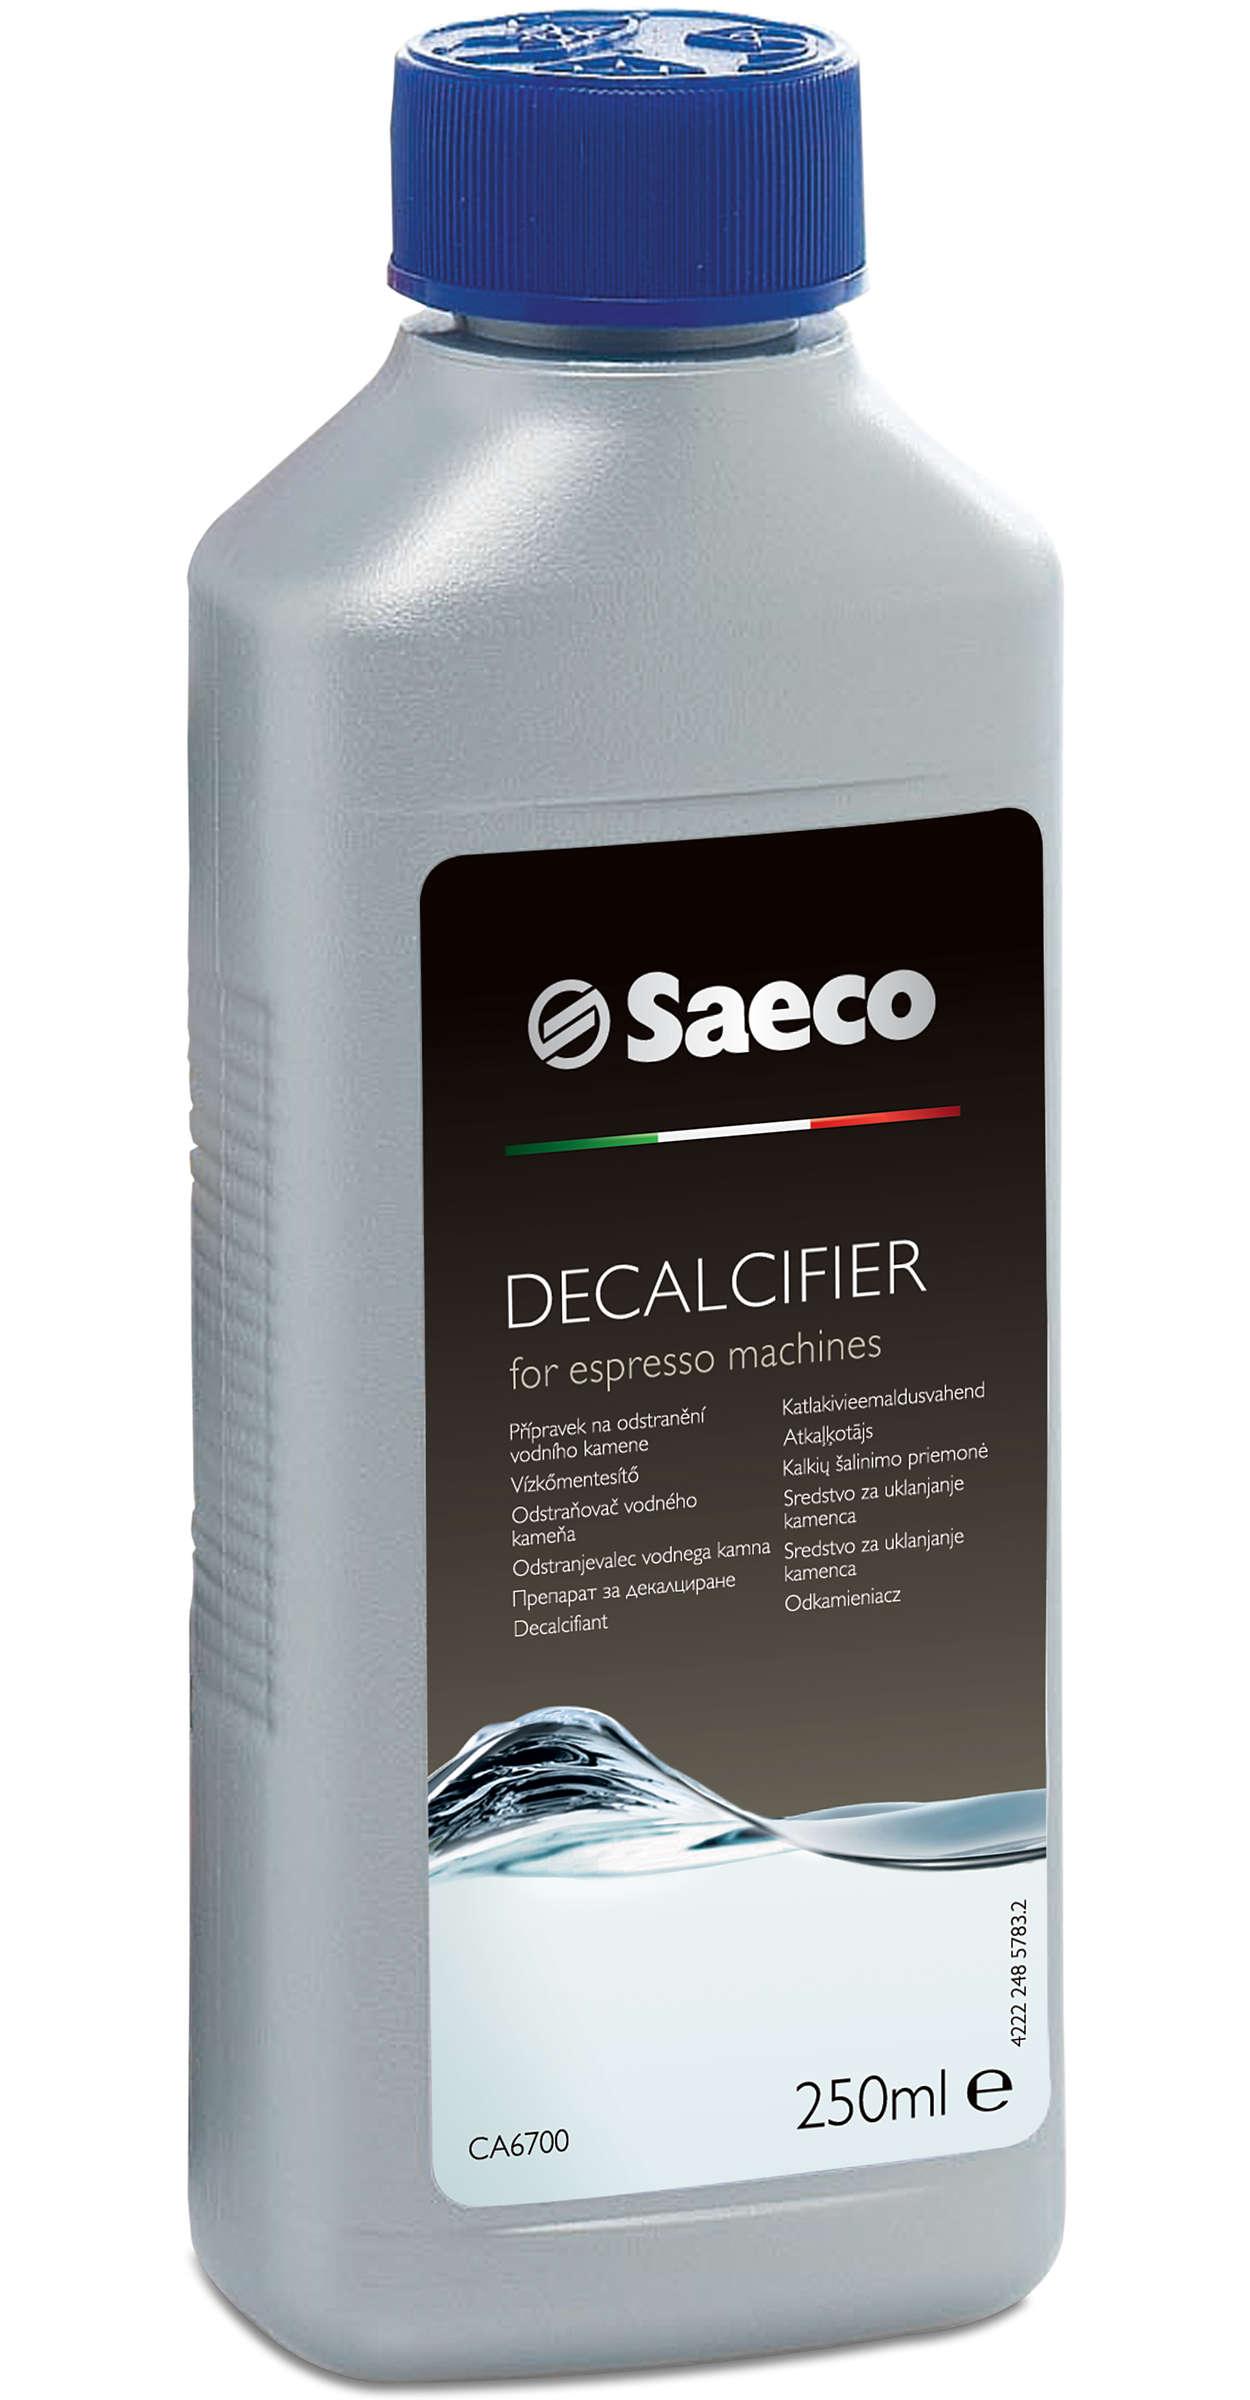 Dokonalá ochrana pro váš espresovač